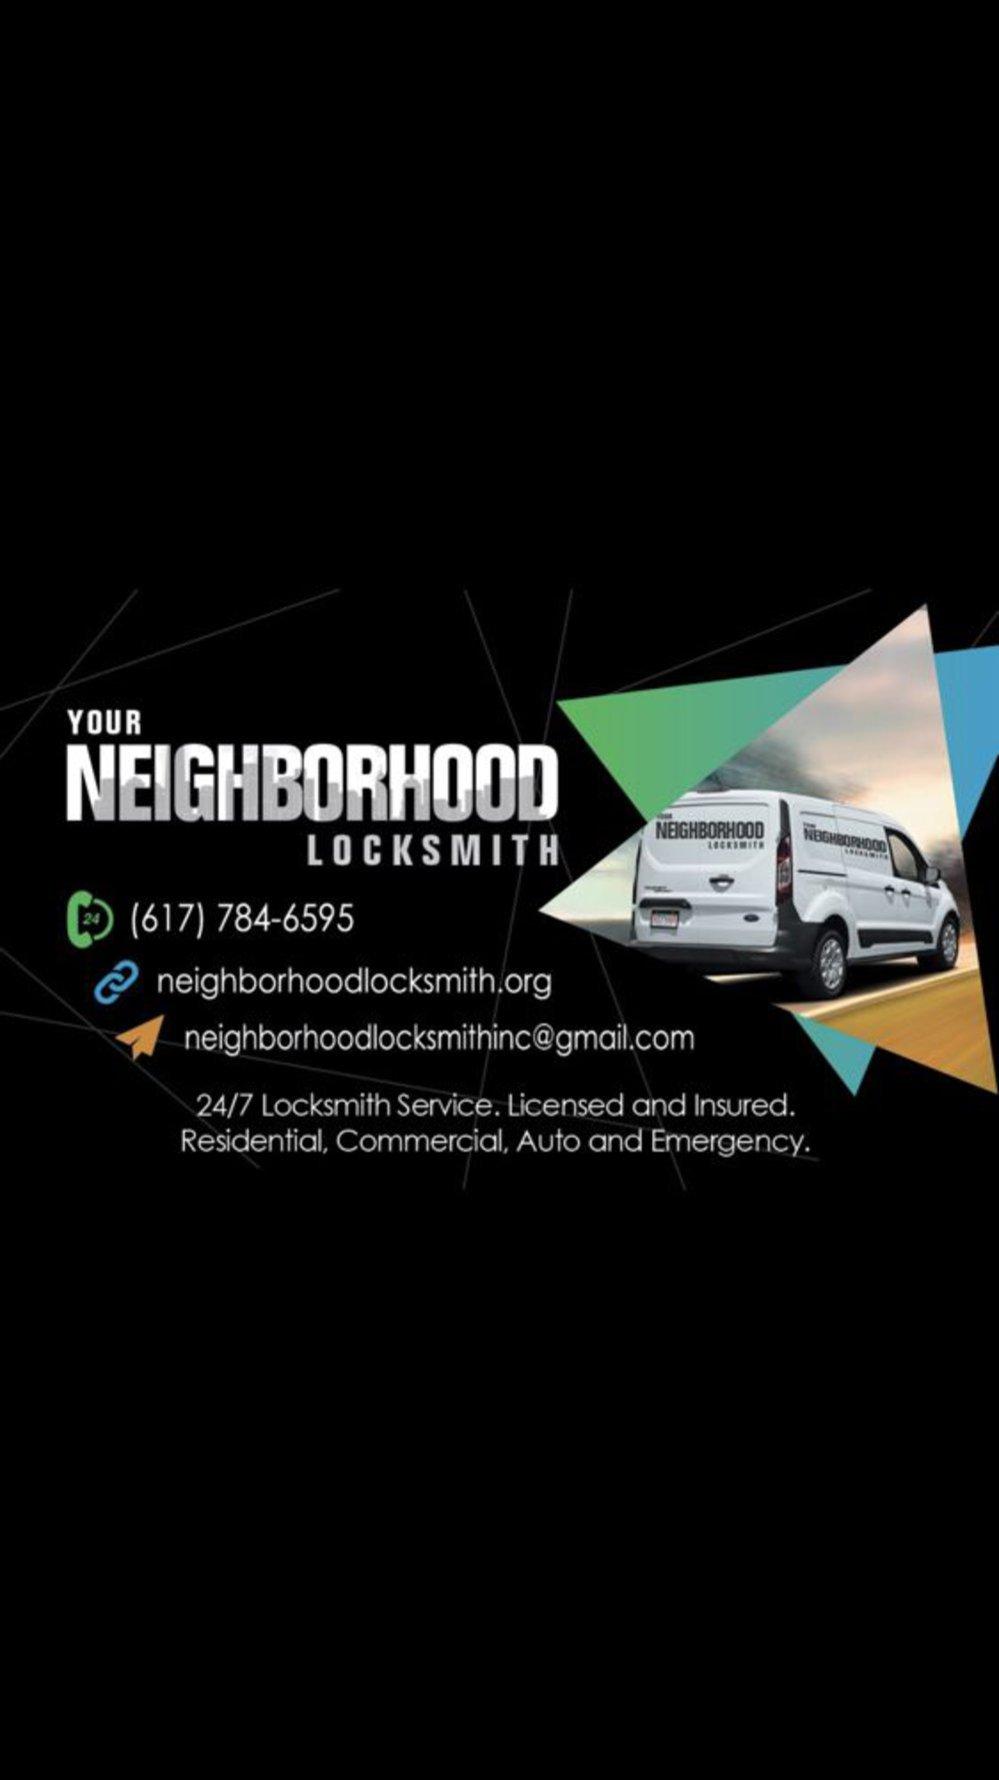 Your Neighborhood Locksmith cover